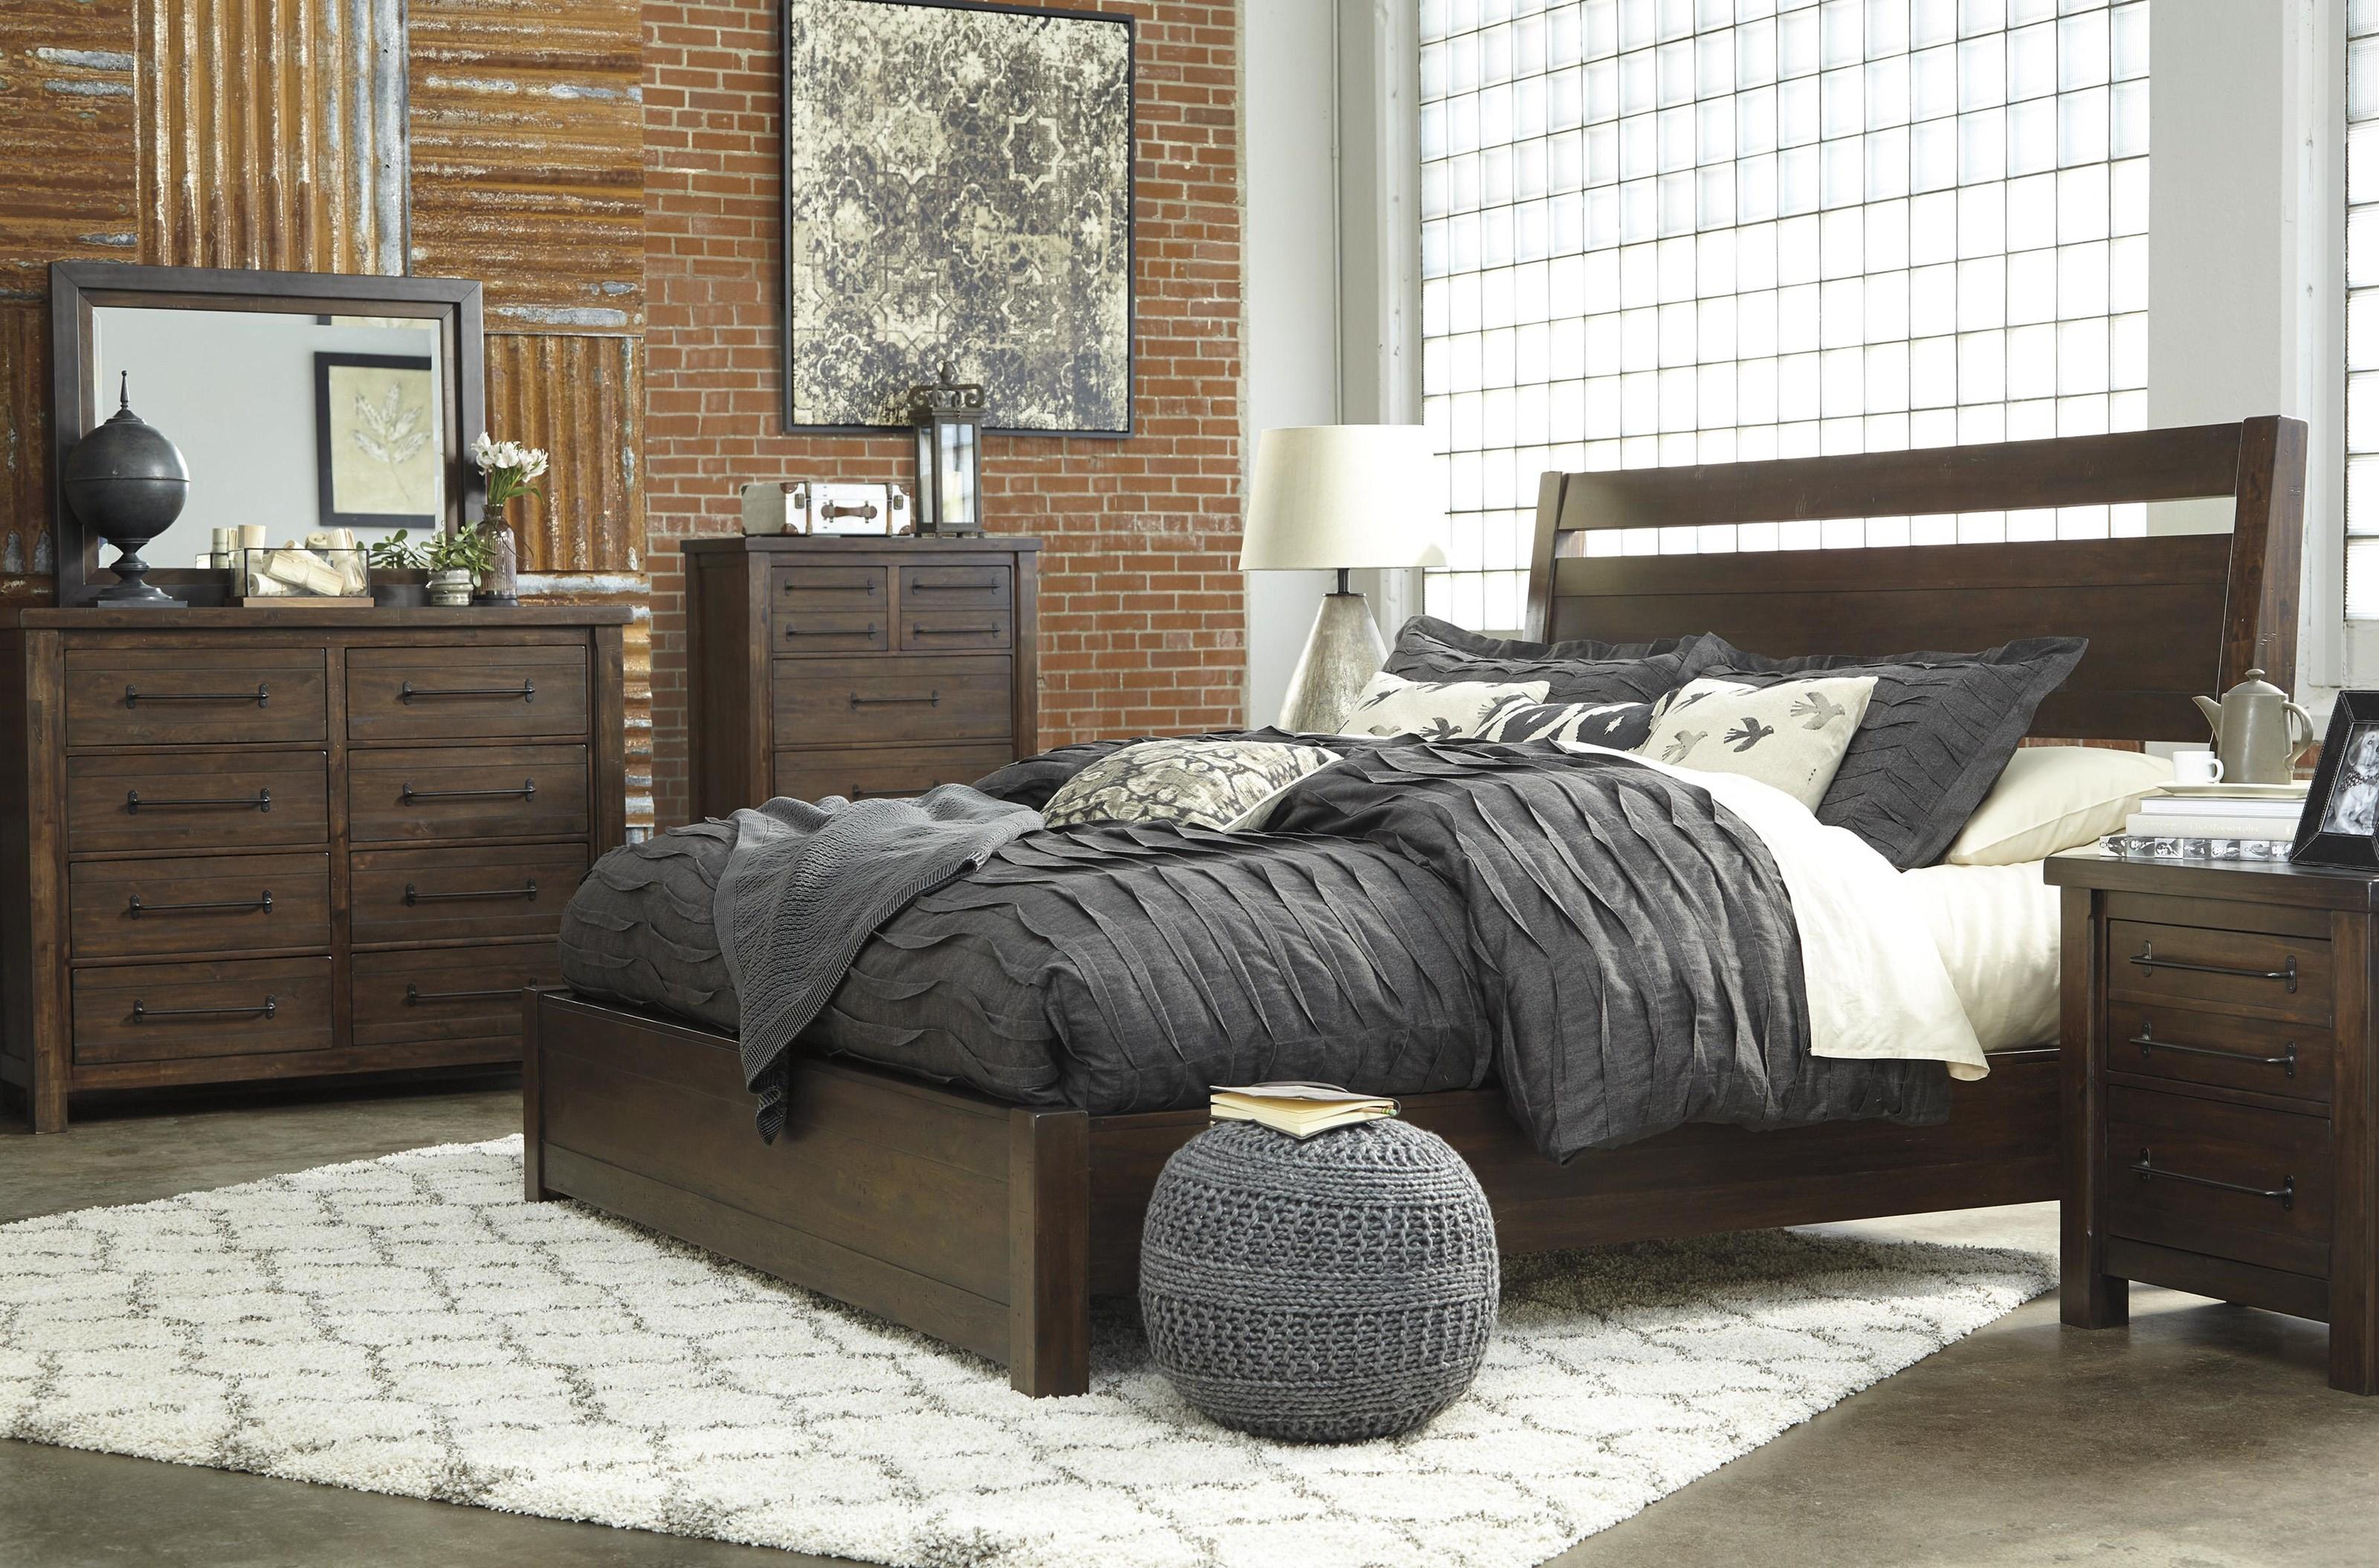 Starmore Queen Platform Bed Package by Millennium at Sam Levitz Furniture